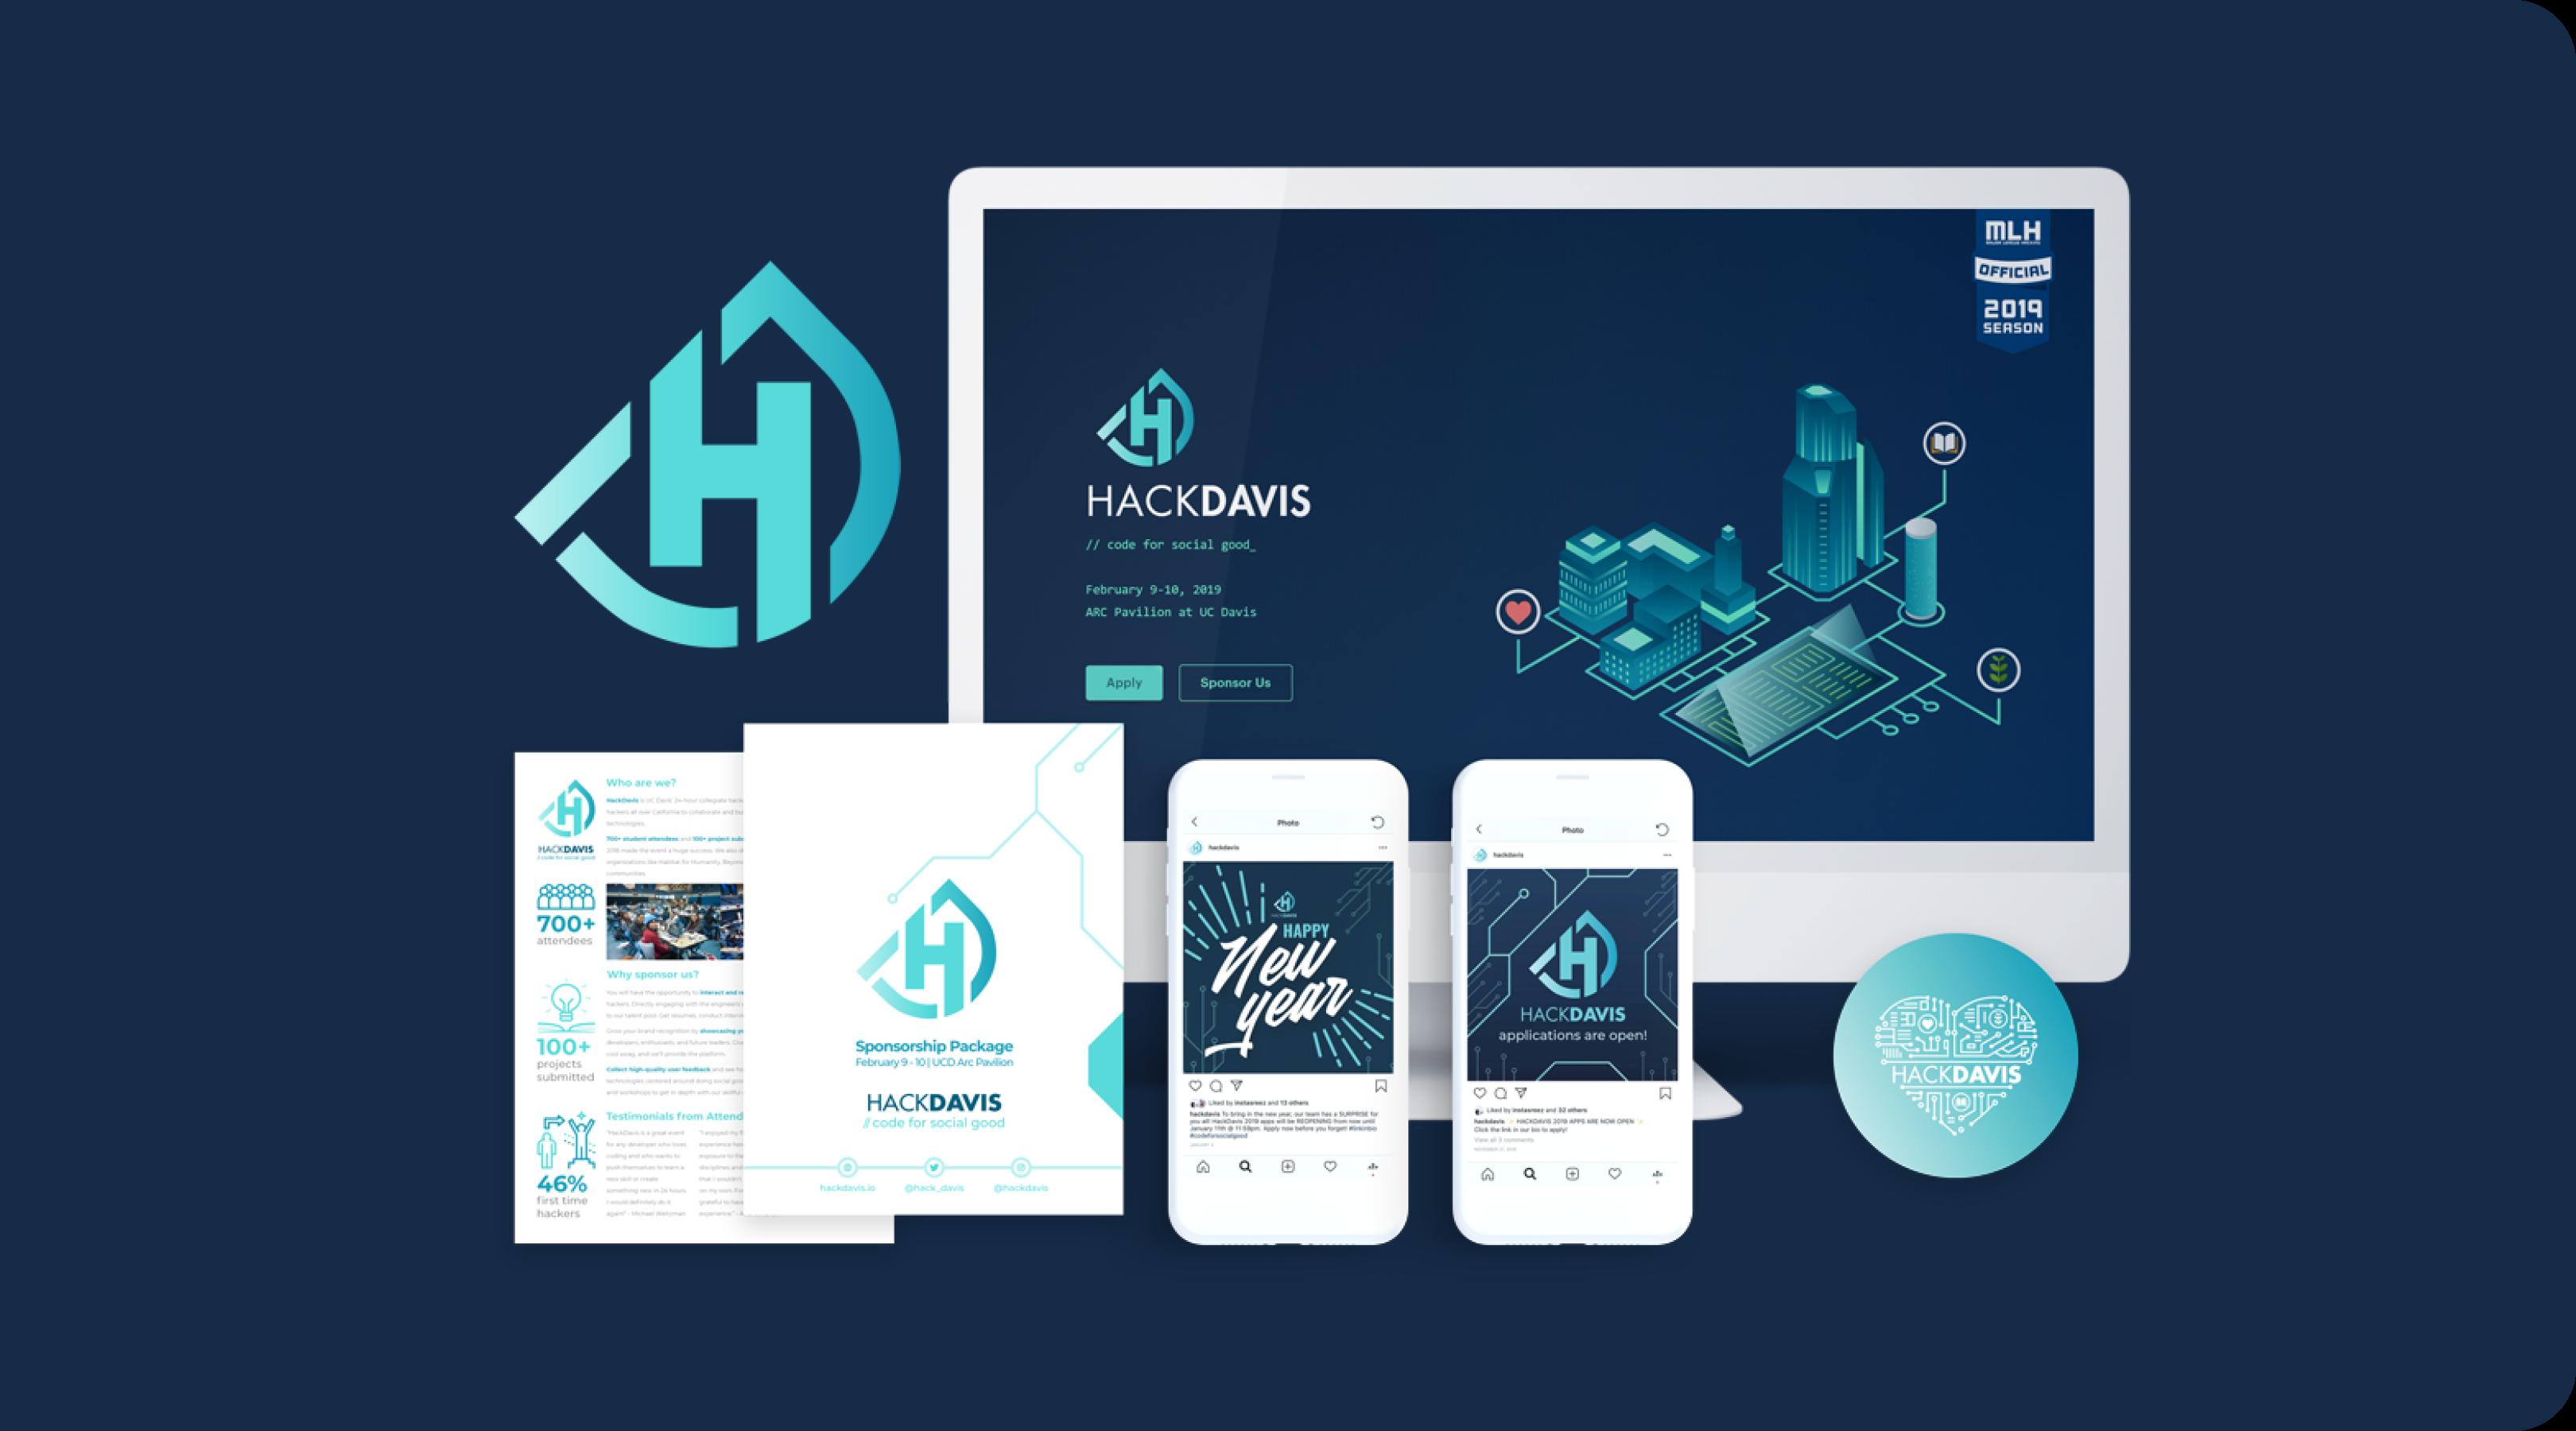 HackDavis 2019